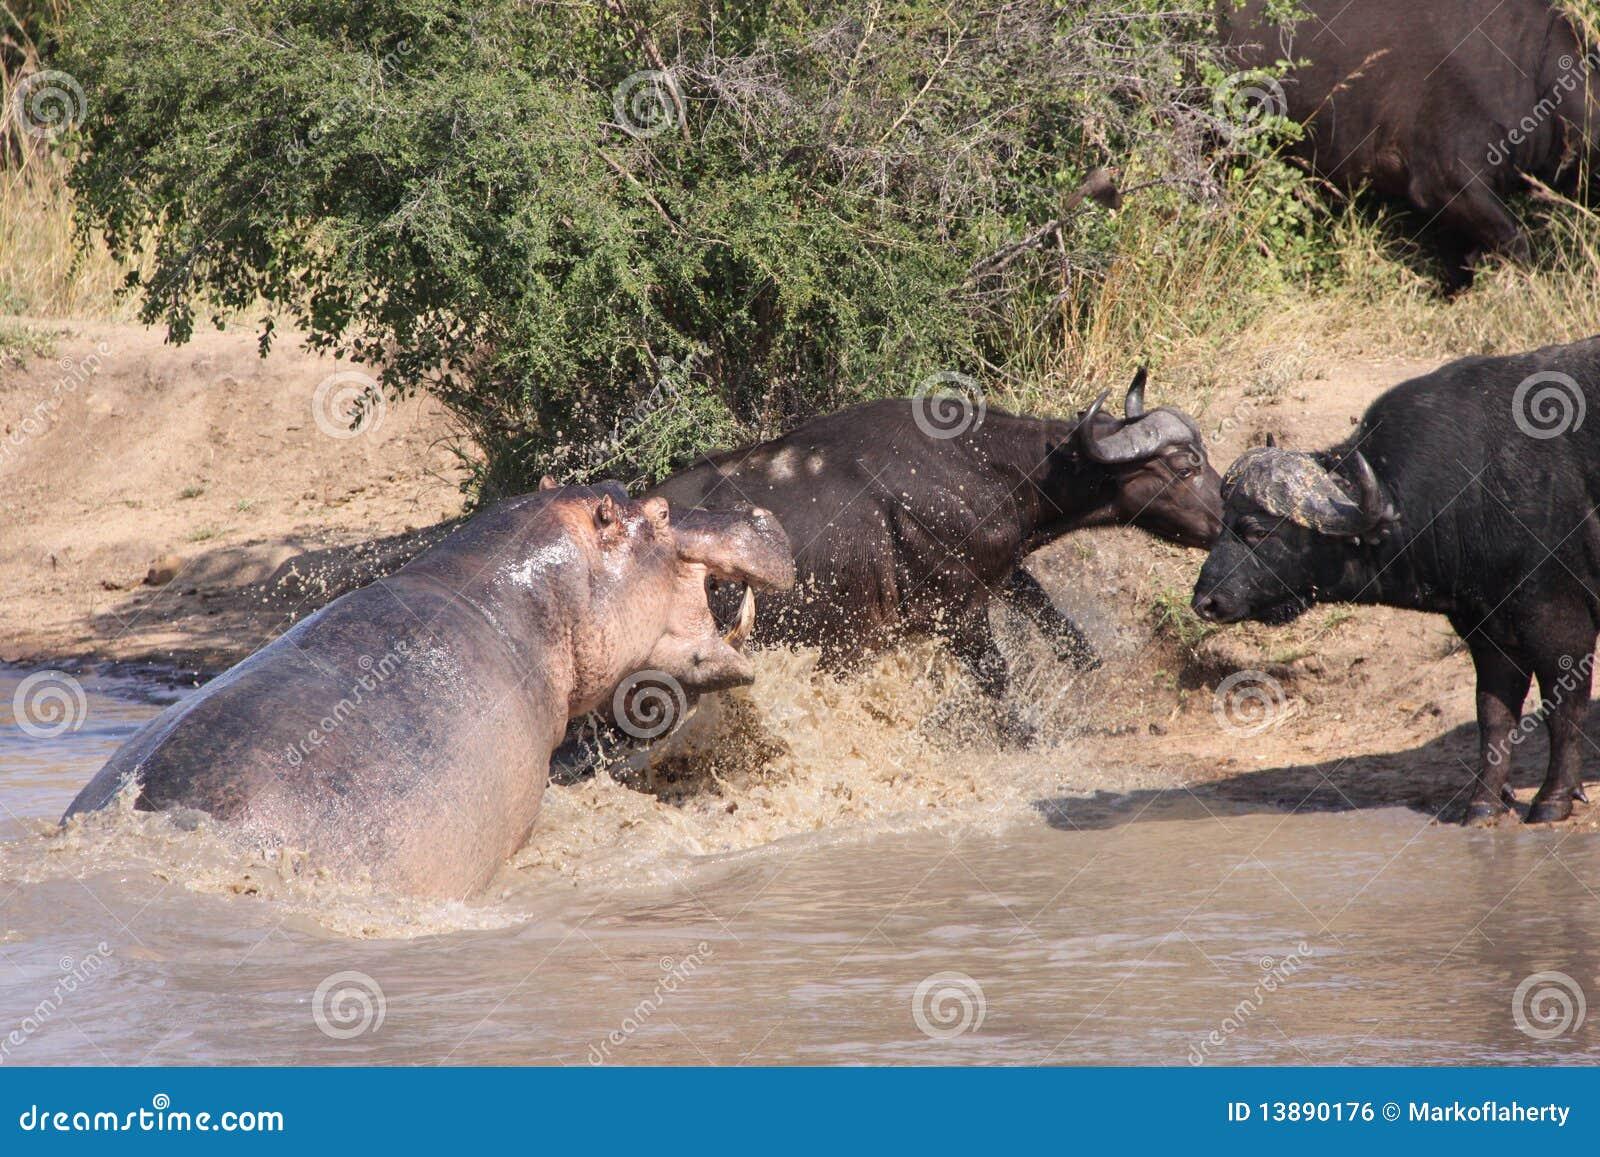 Hippo Attacking Cape Buffalo Stock Photo - Image of buffalo